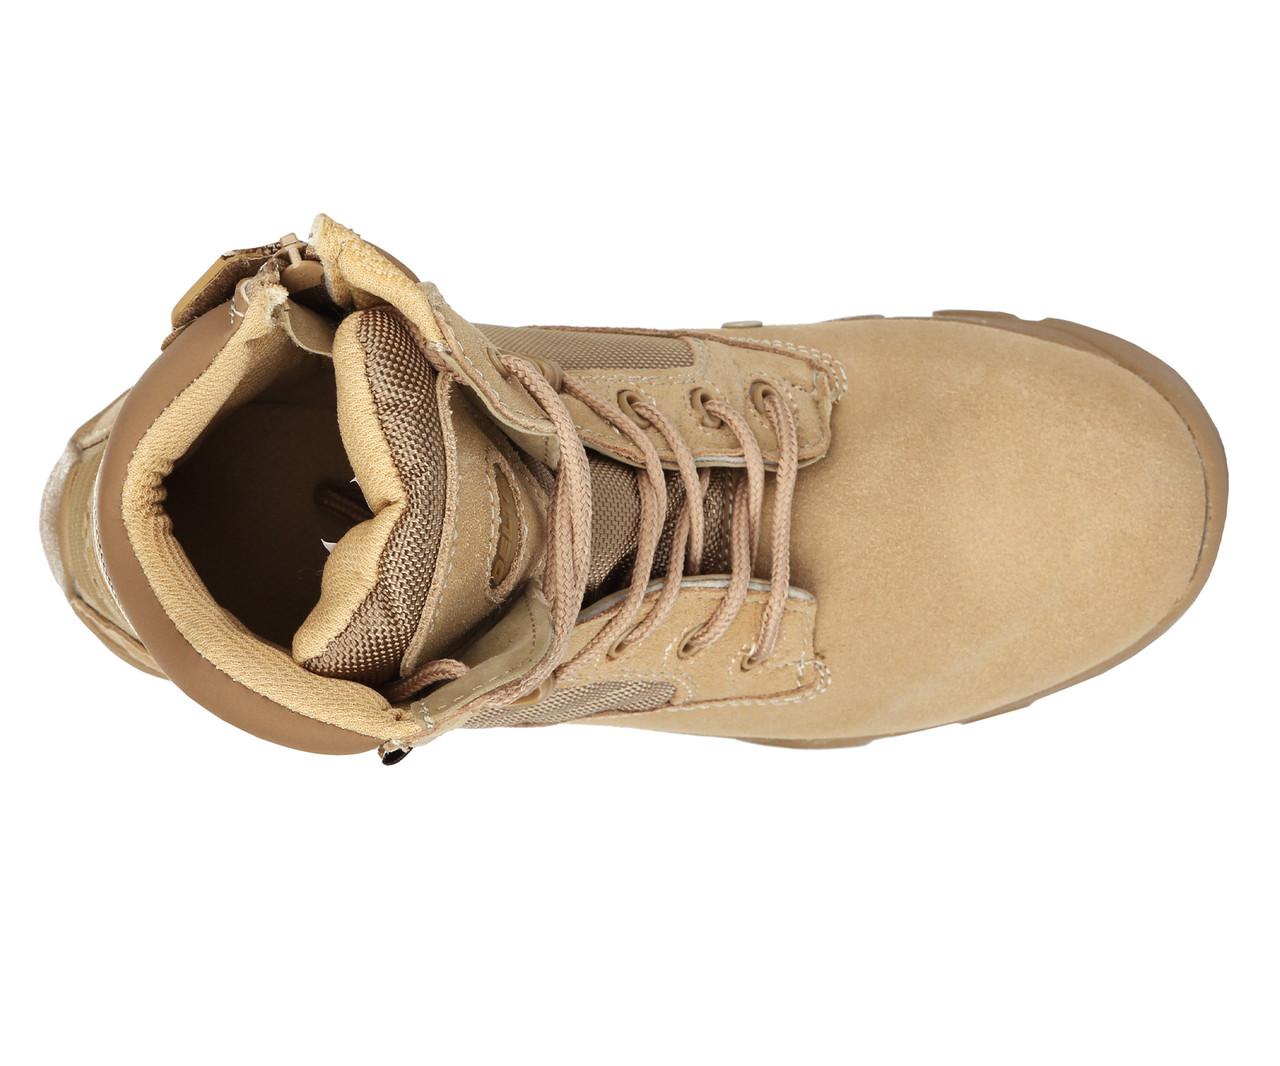 b9c3102e7 ... DELTA Army Classic 9 inch Sand   ботинки армейские мужские бежевые, ...